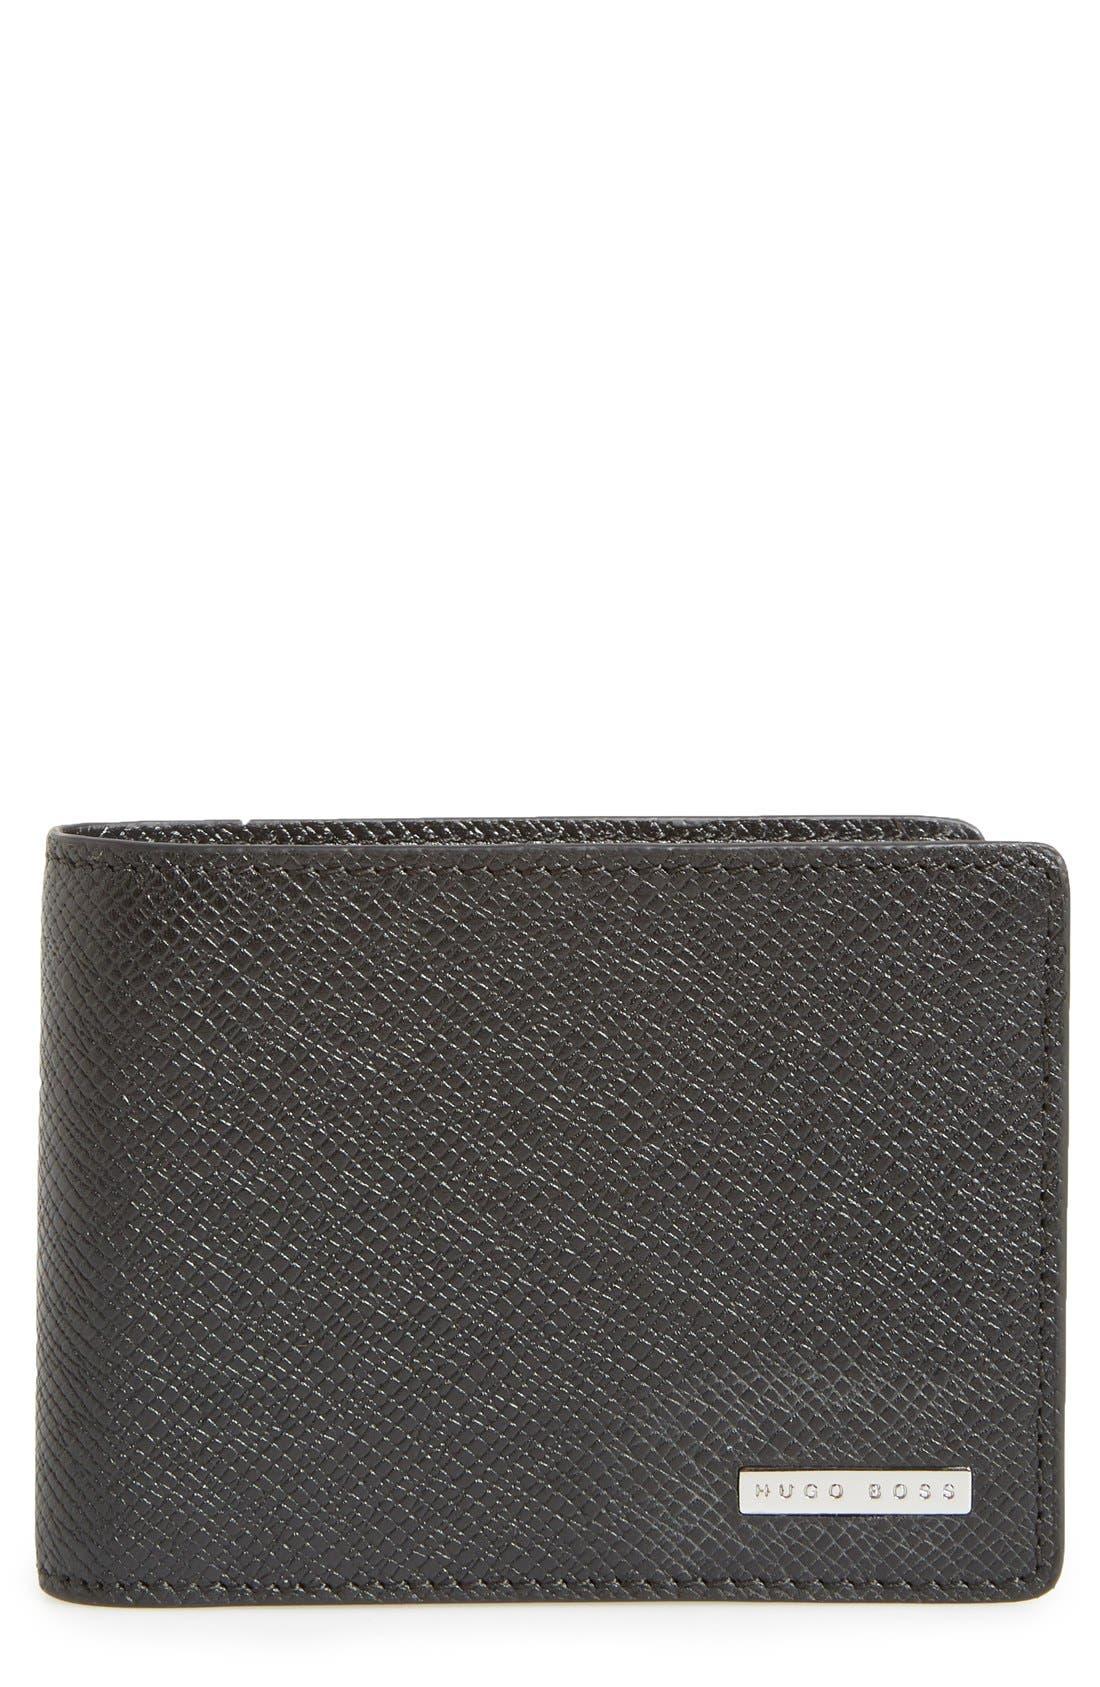 Alternate Image 1 Selected - BOSS 'Signature' Bifold Calfskin Leather Wallet